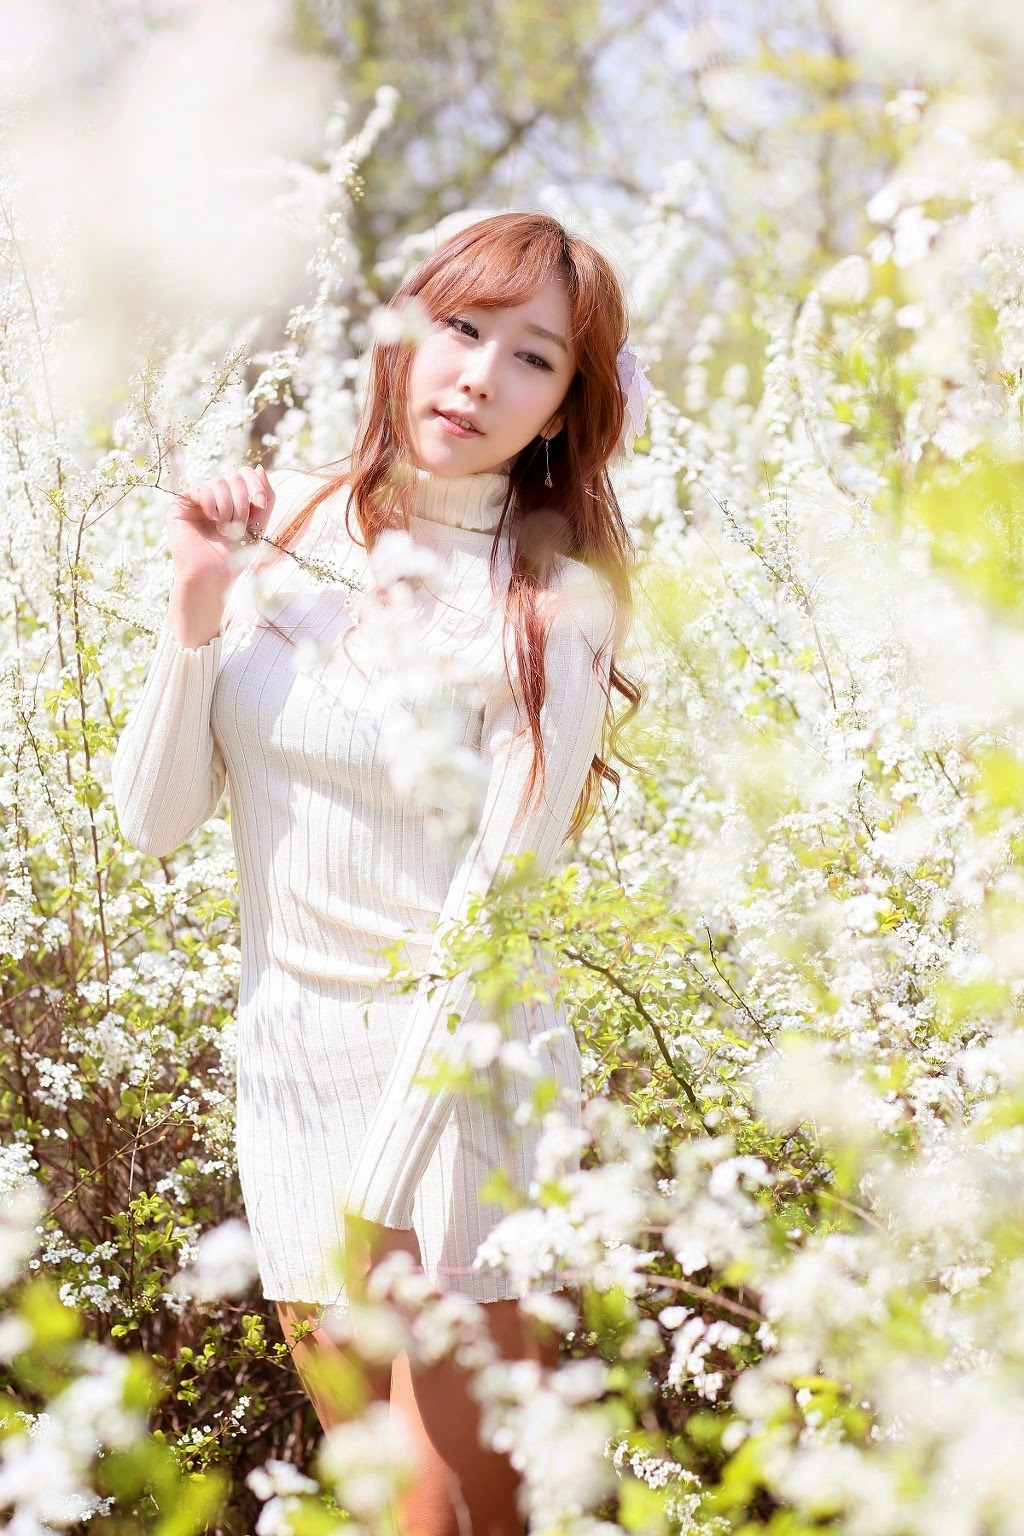 5 Kim Da On - Down By The River - very cute asian girl-girlcute4u.blogspot.com